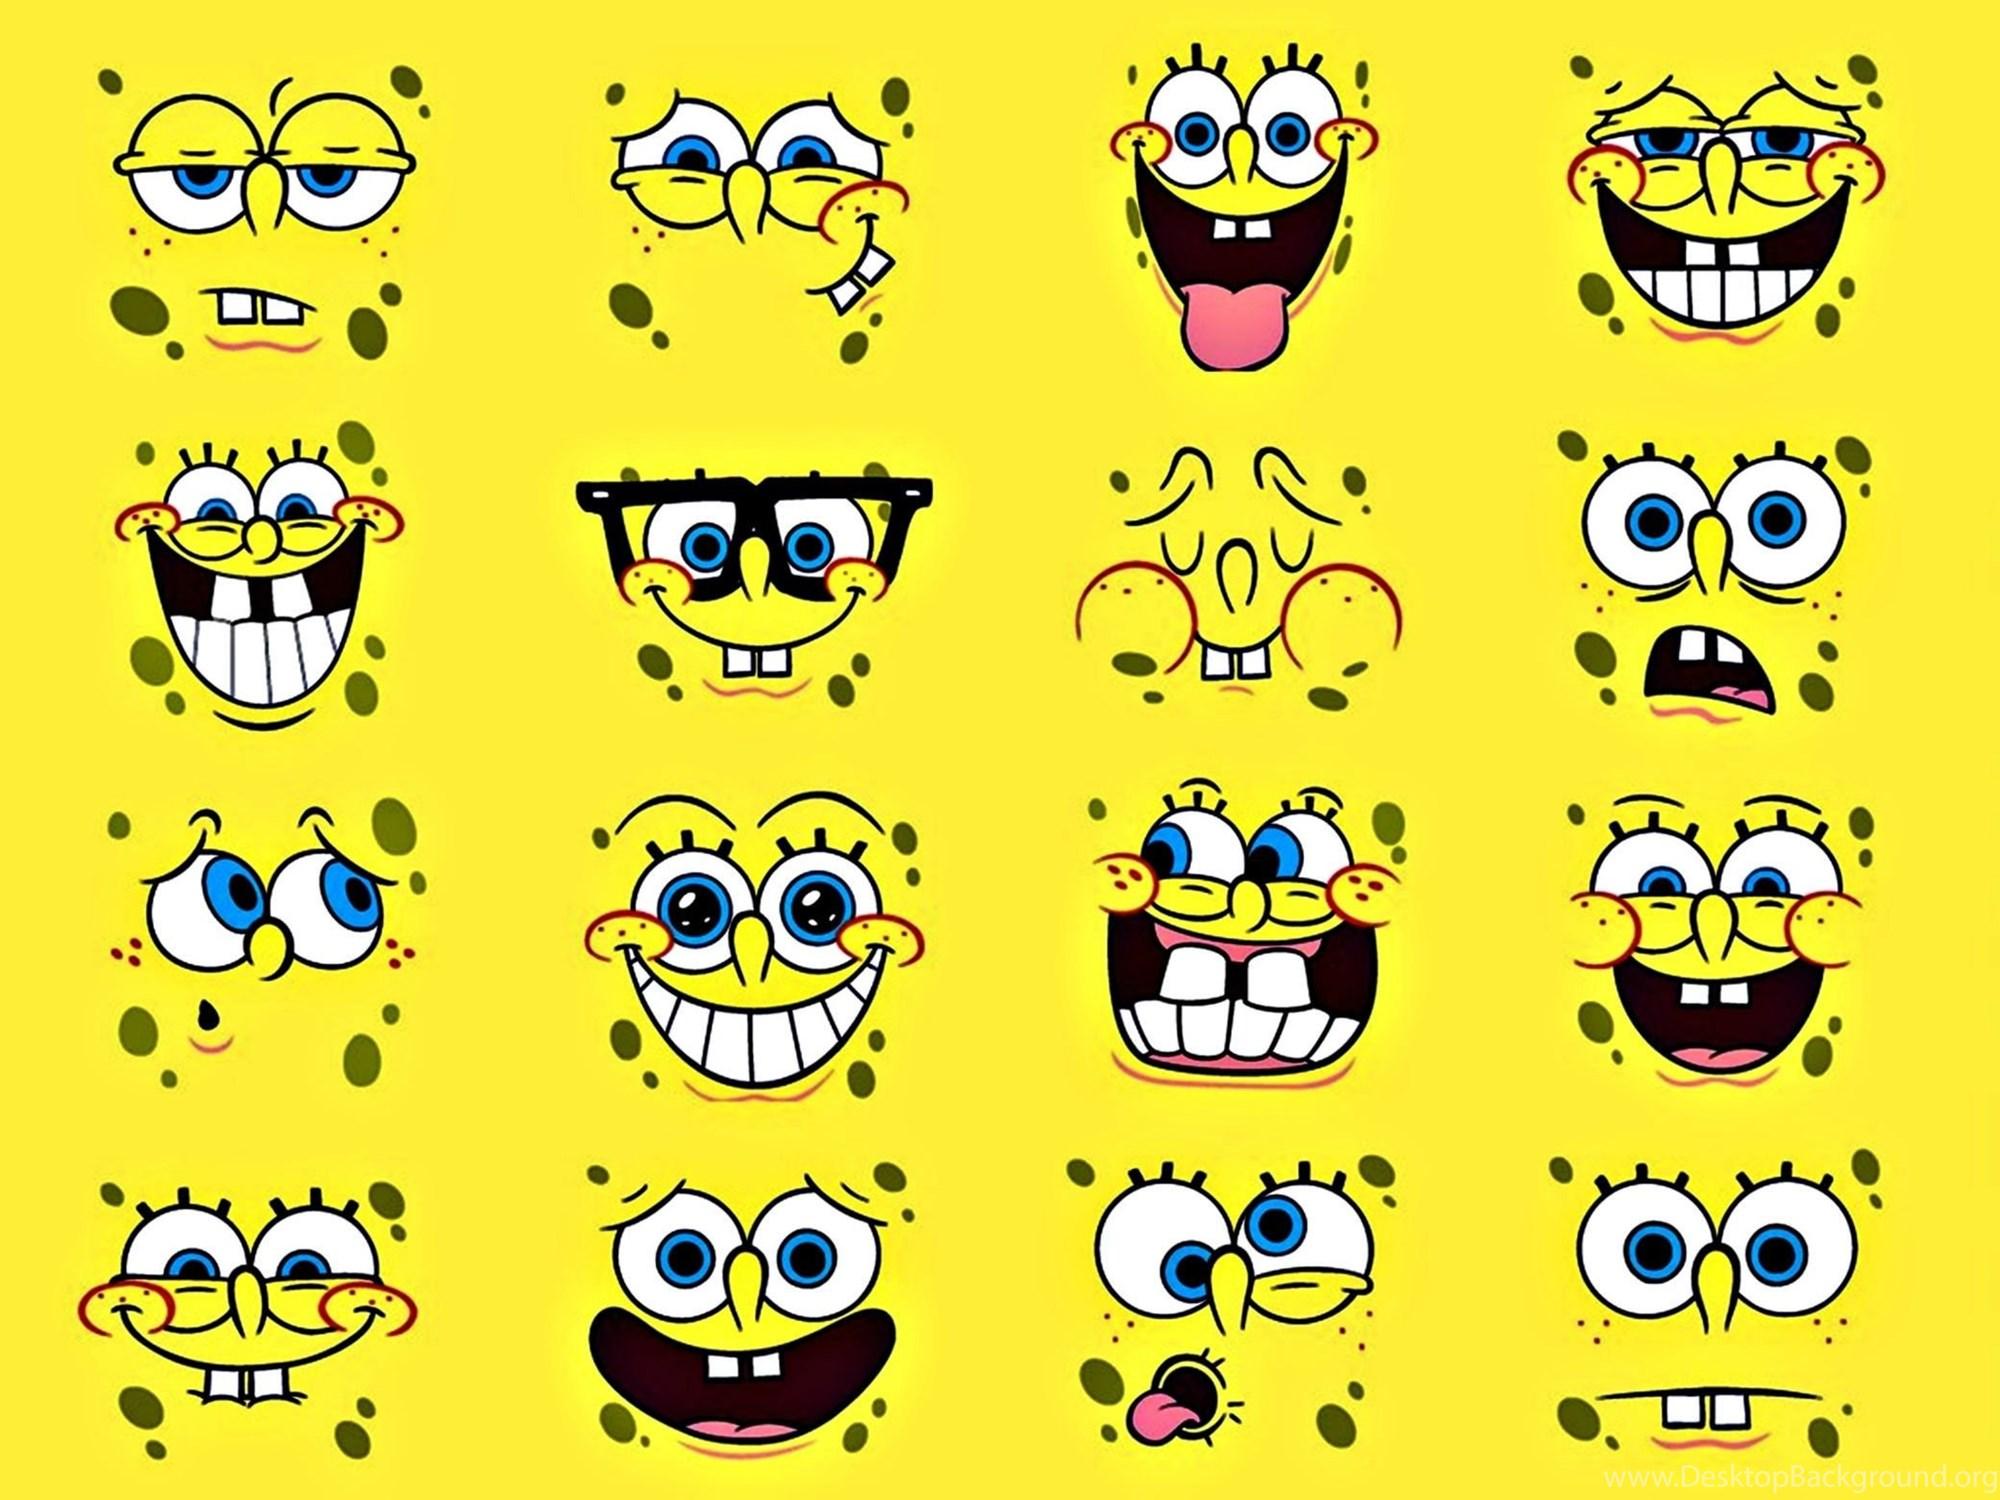 Face Spongebob Squarepants Anime Hd Wallpapers Picture Desktop